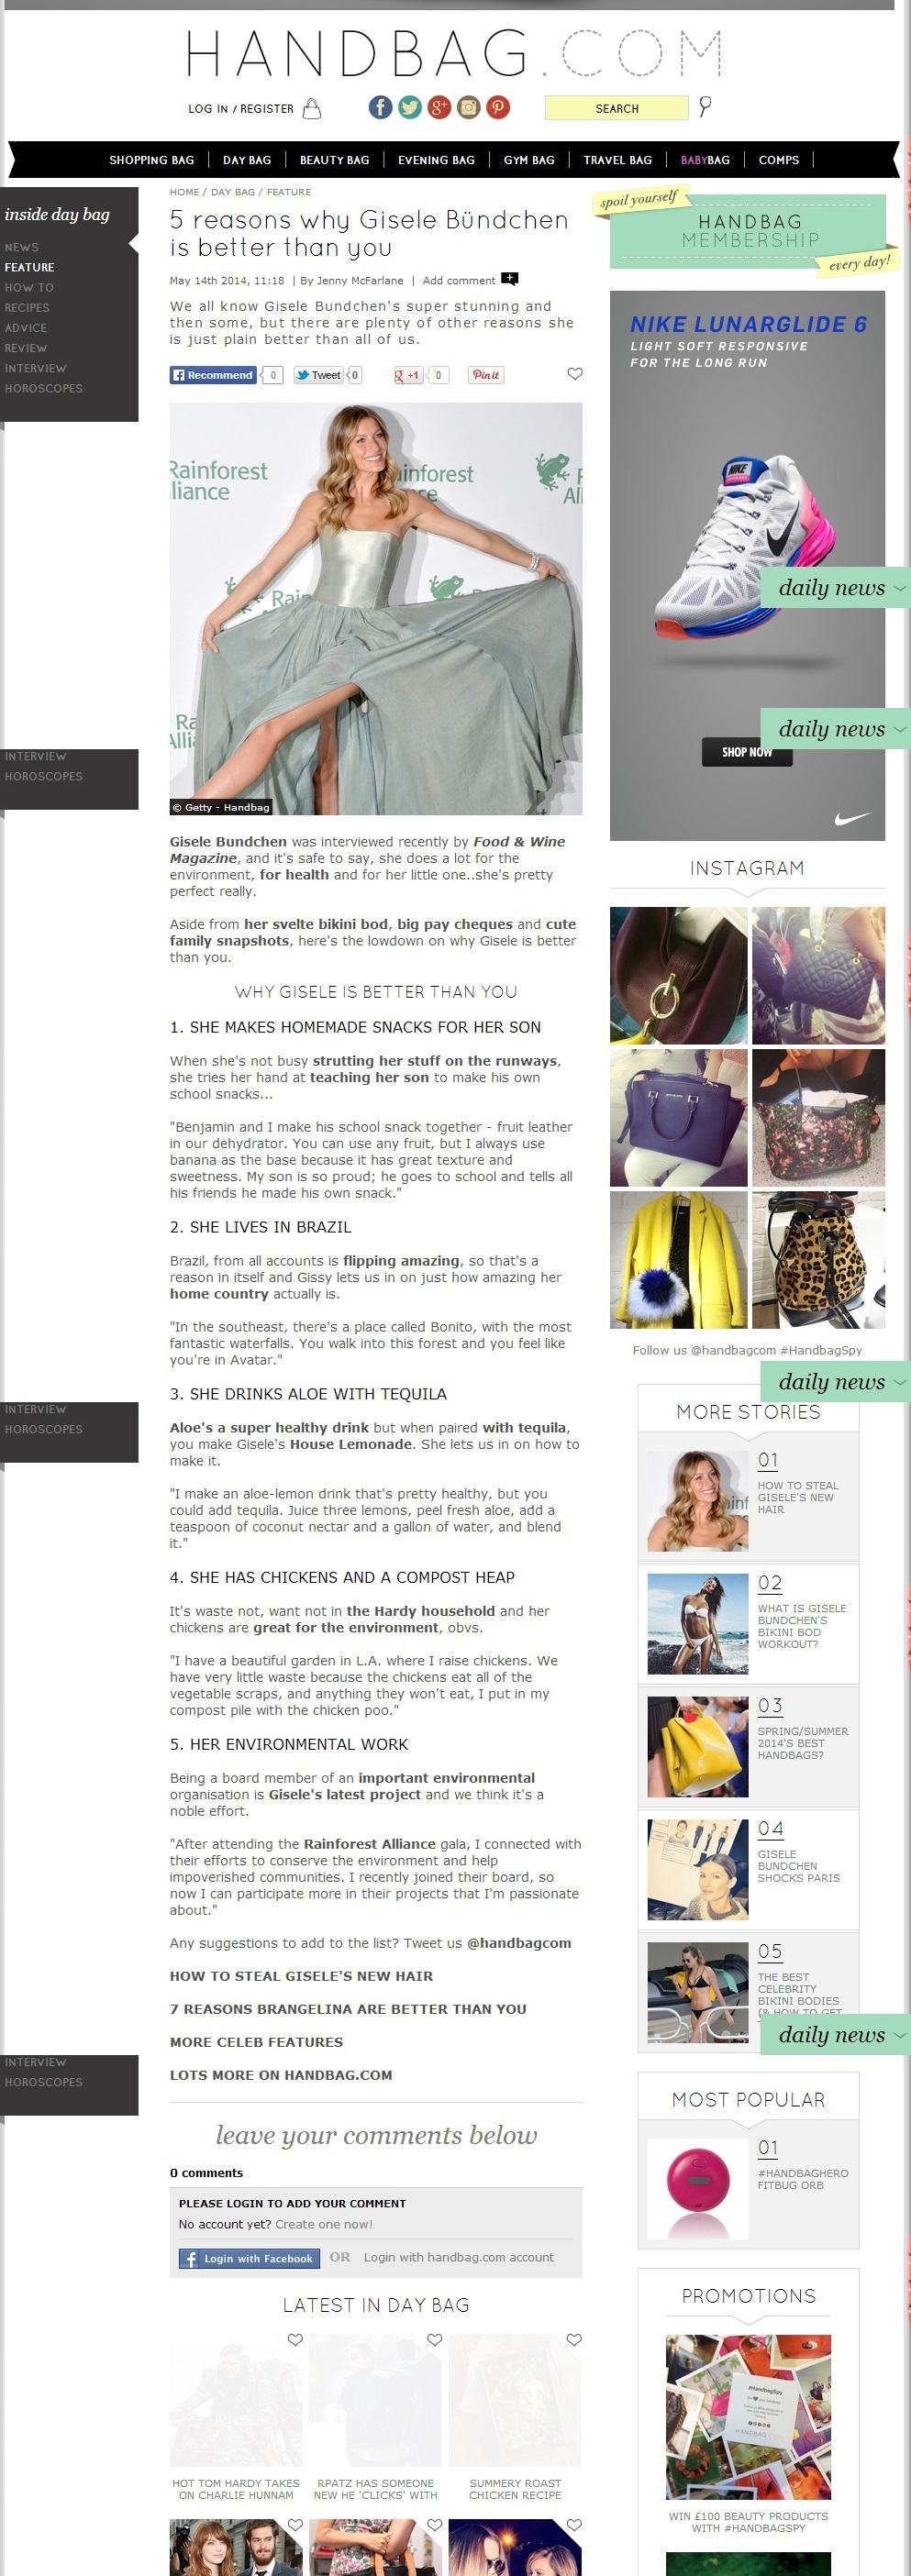 screencapture-www-handbag-com-day-bag-feature-a570926-5-reasons-why-gisele-bundchen-is-better-than-you-html